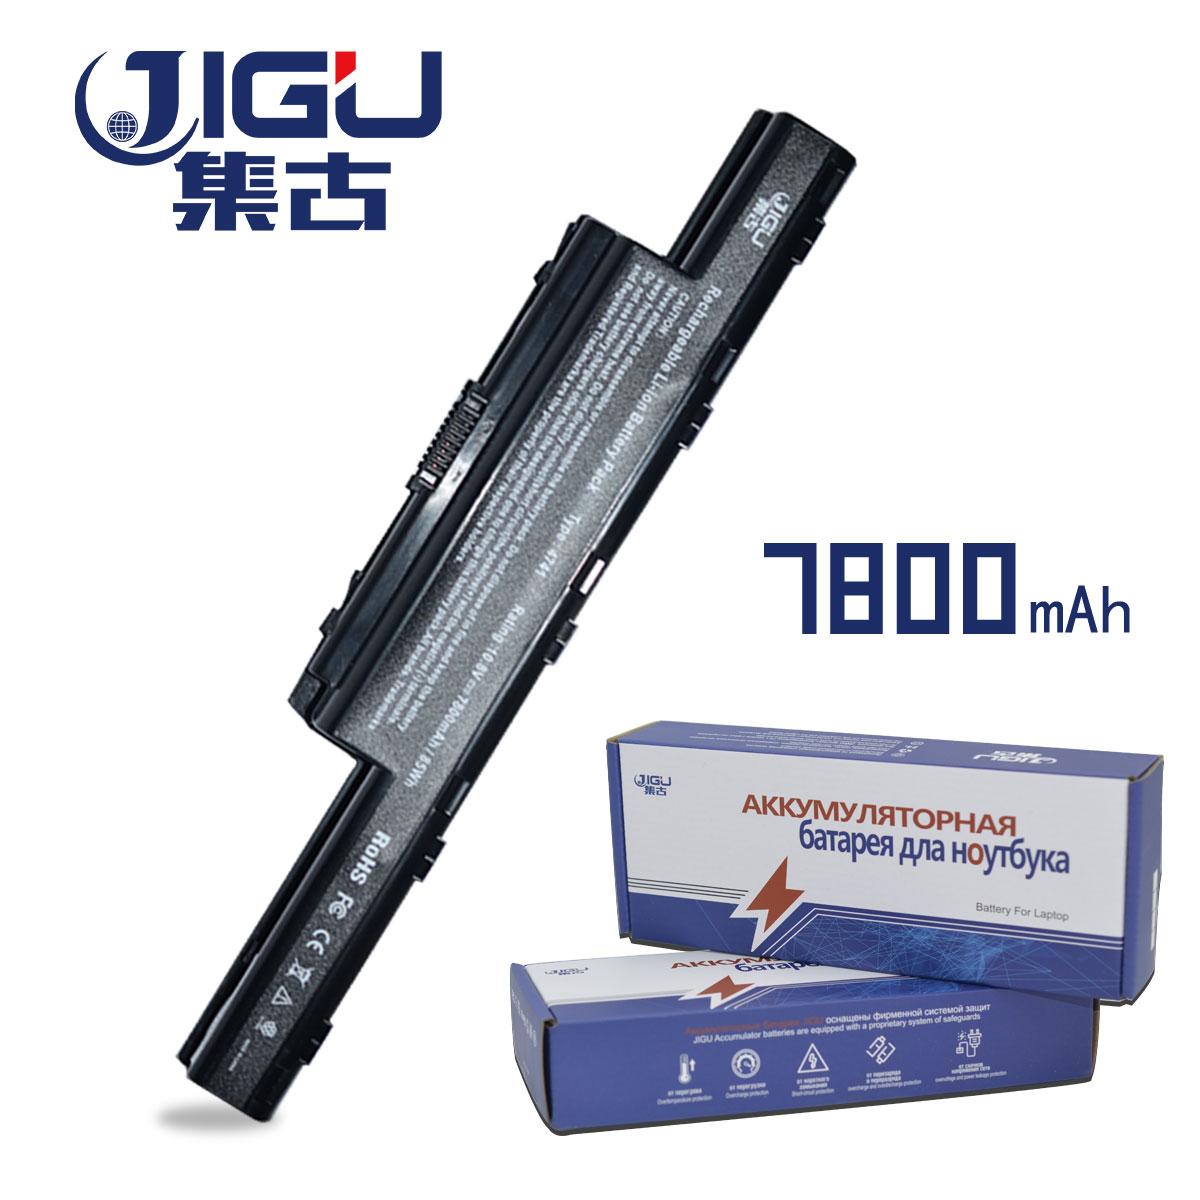 JIGU 7750g 9 Cells Battery For Acer Aspire 4741 7750g 5742 5745g AS10D31 AS10D51 AS10D75 AS10D71 As10d81 5750 As10d75 Battery цена 2017